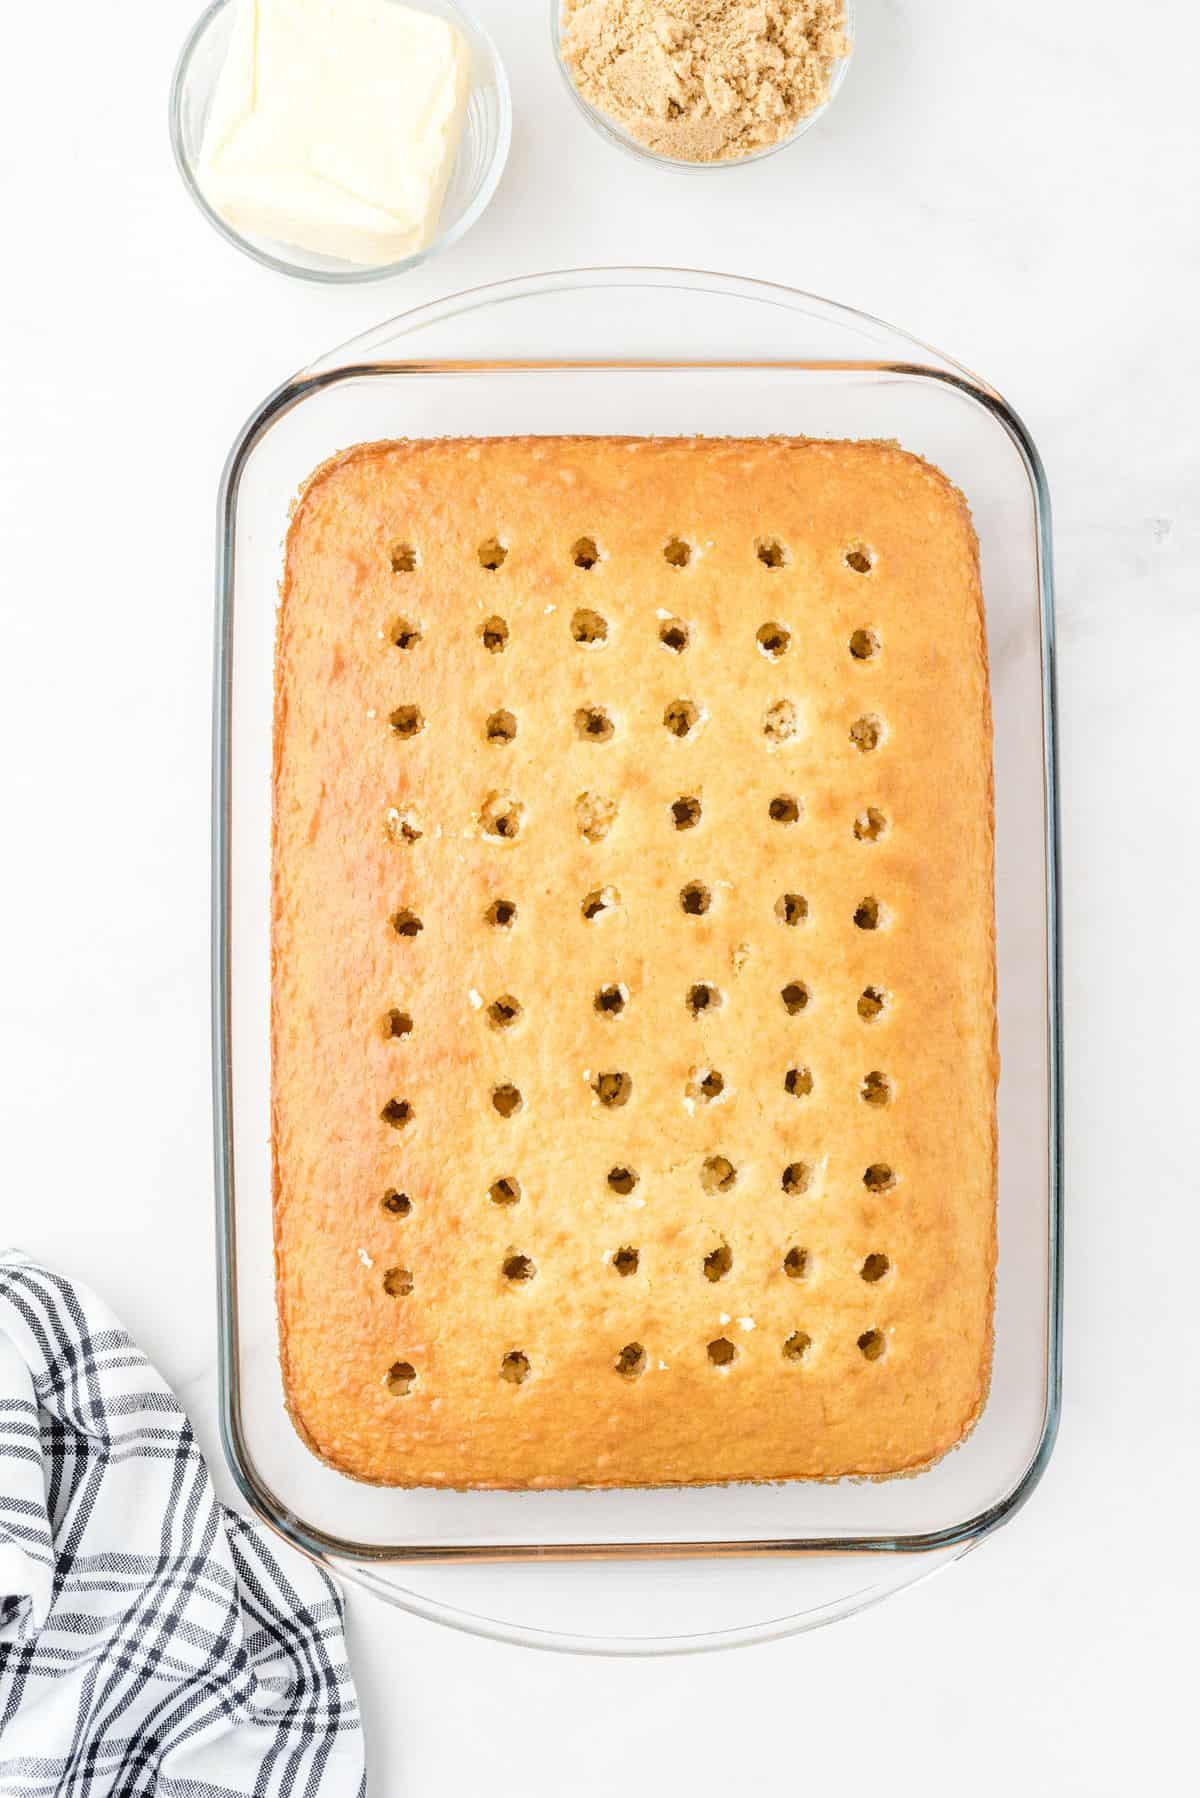 cinnamon roll poke cake with holes